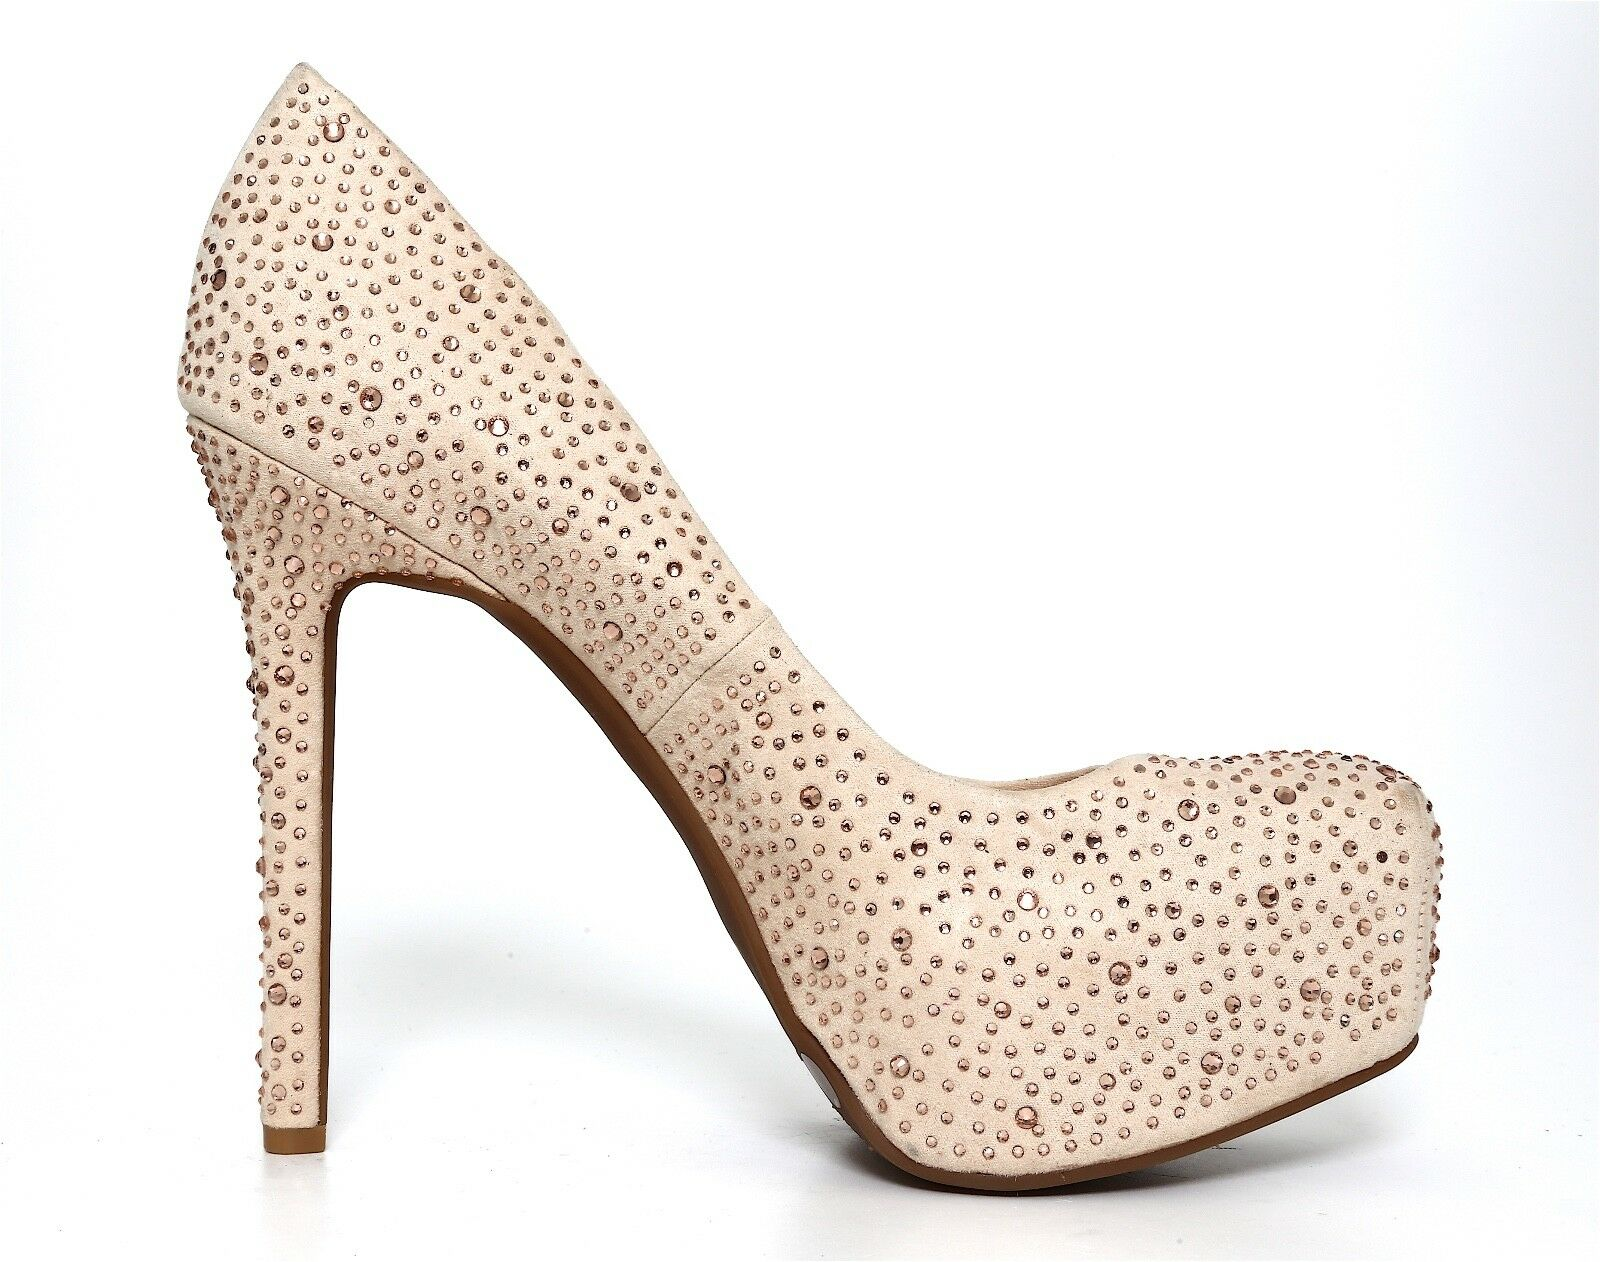 Jessica Simpson Rebeca Suede 7.5 High Heel Pump Beige damen Sz 7.5 Suede M 1421 ff86fe